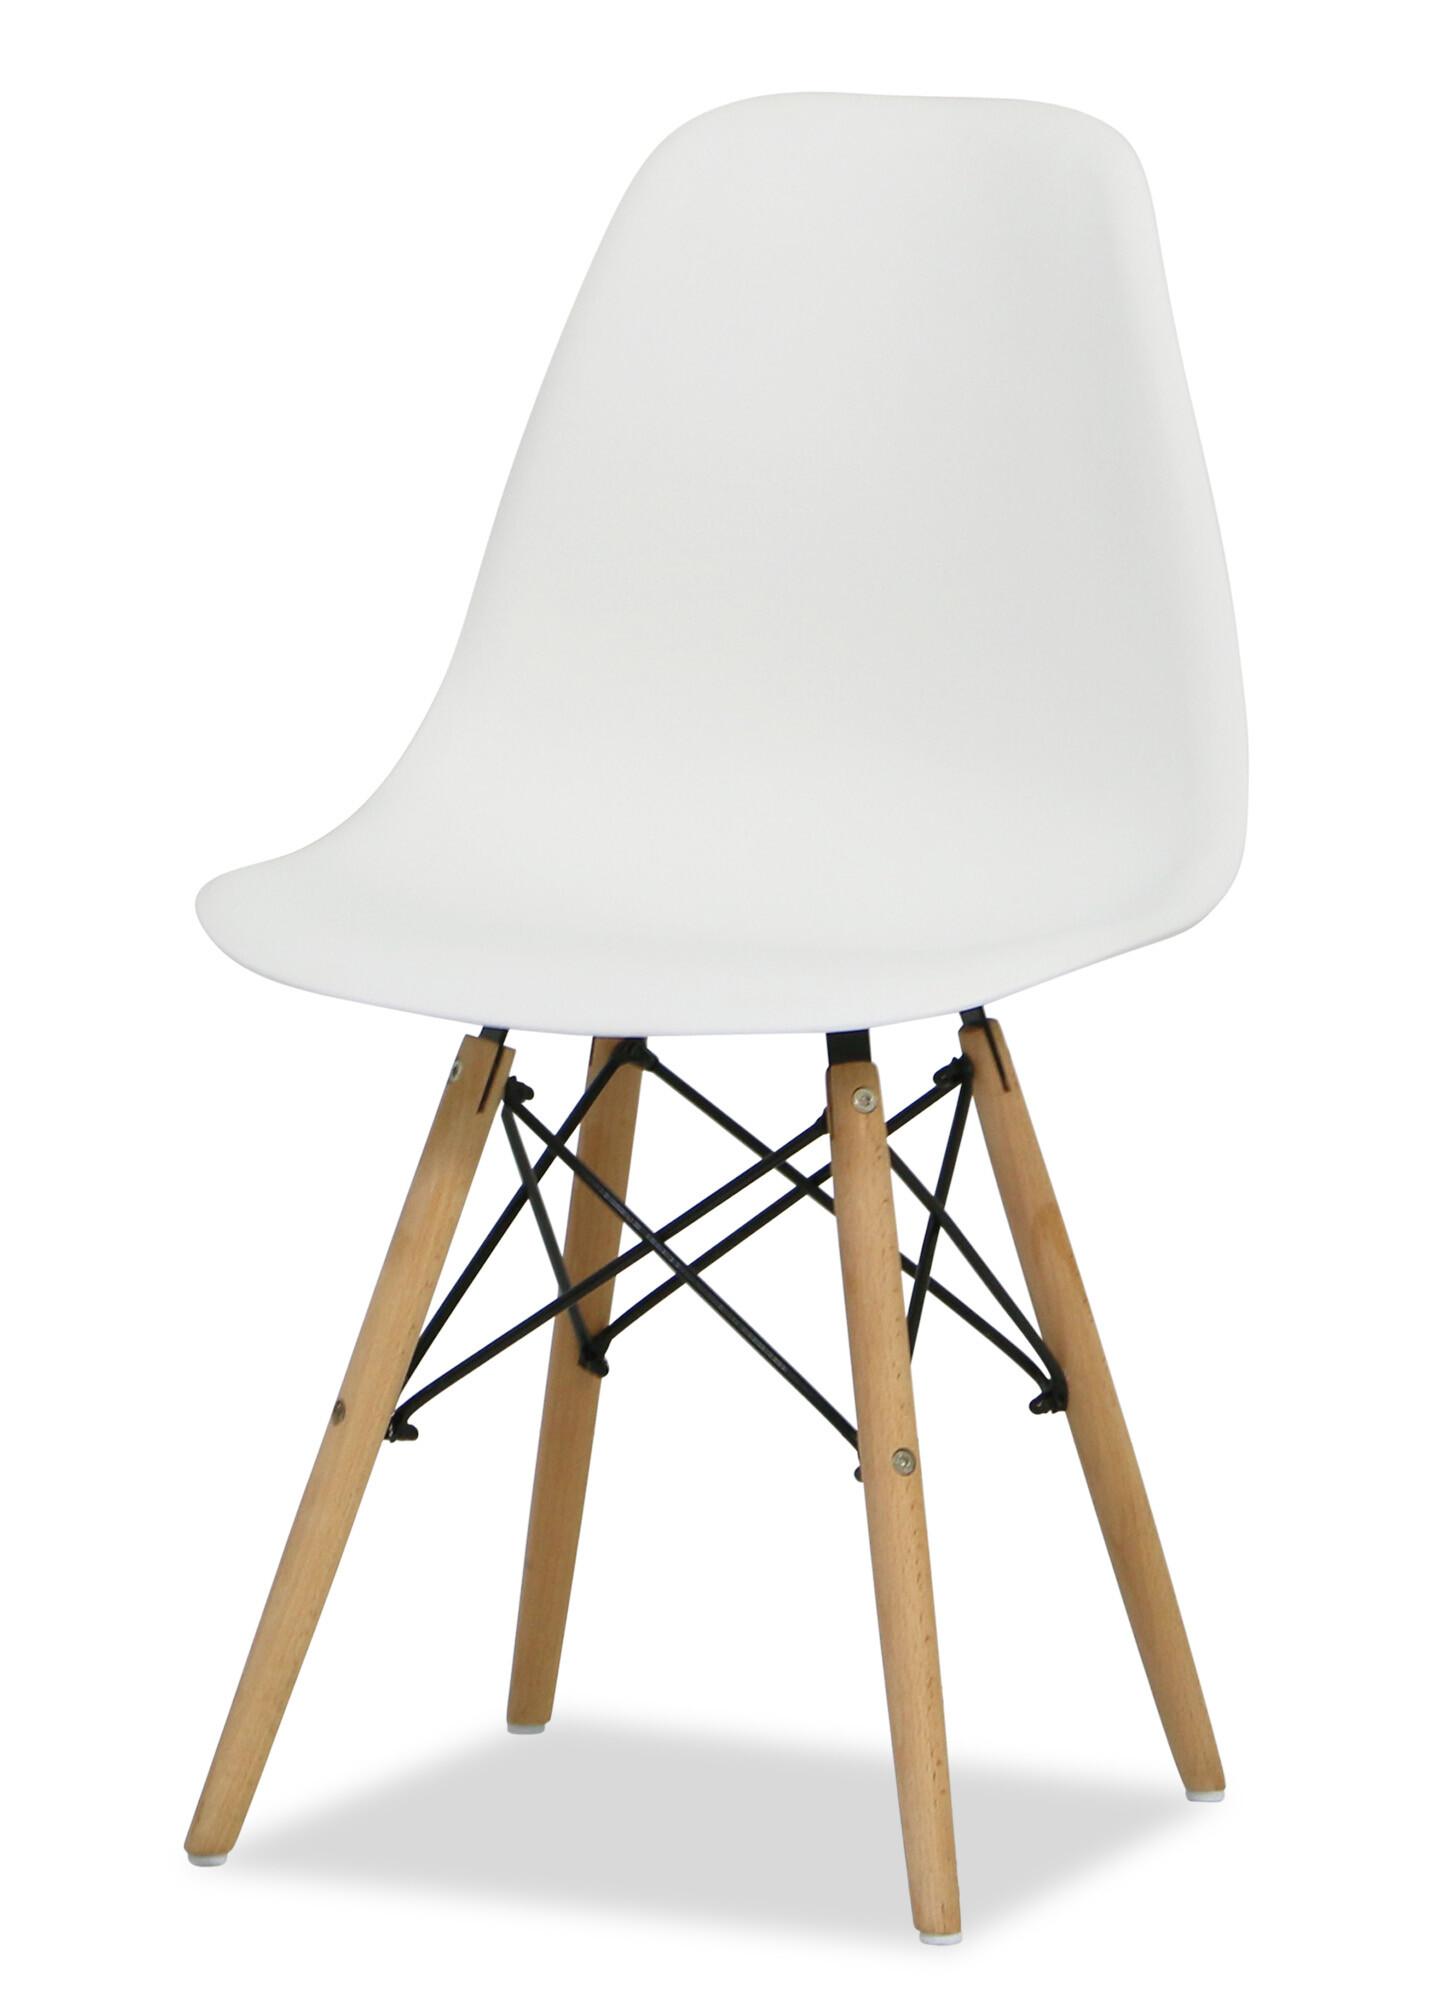 eames chair white spandex covers ebay replica designer furniture home decor fortytwo